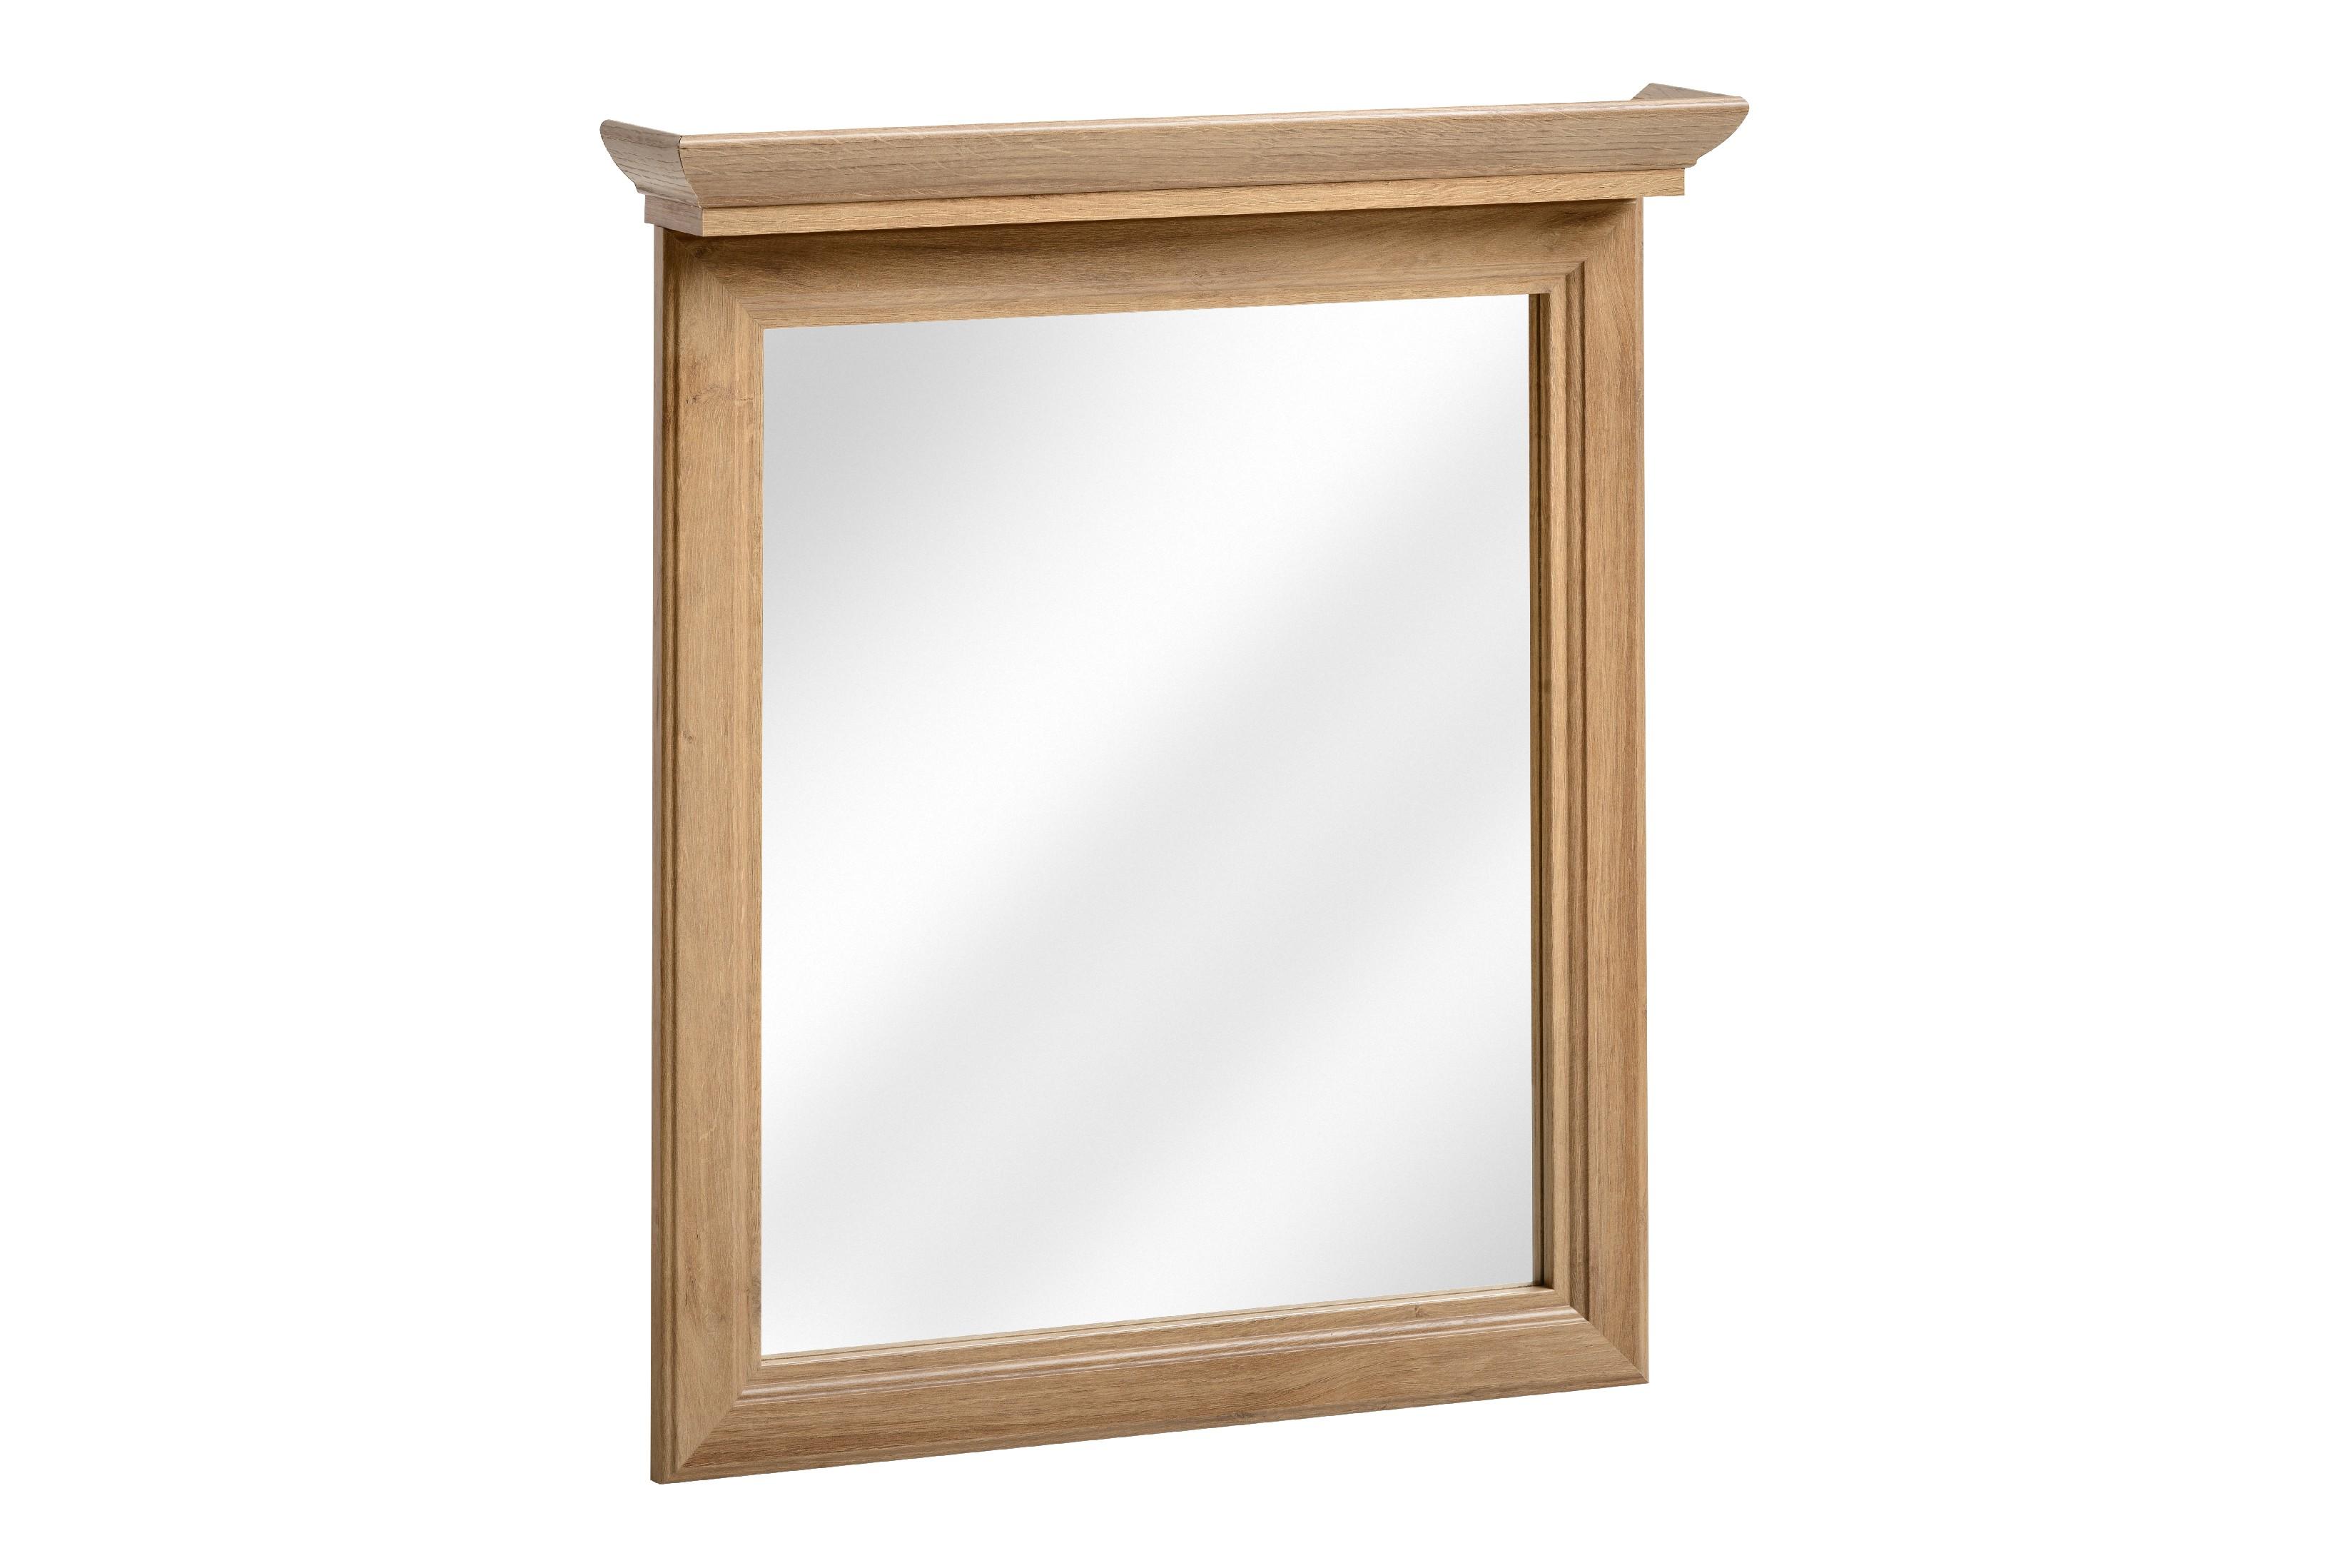 ArtCom Kúpeľňová zostava PALACE RIVIERA Palace: Zrkadlo 60 - 840 - 76 x 60 x 11 cm